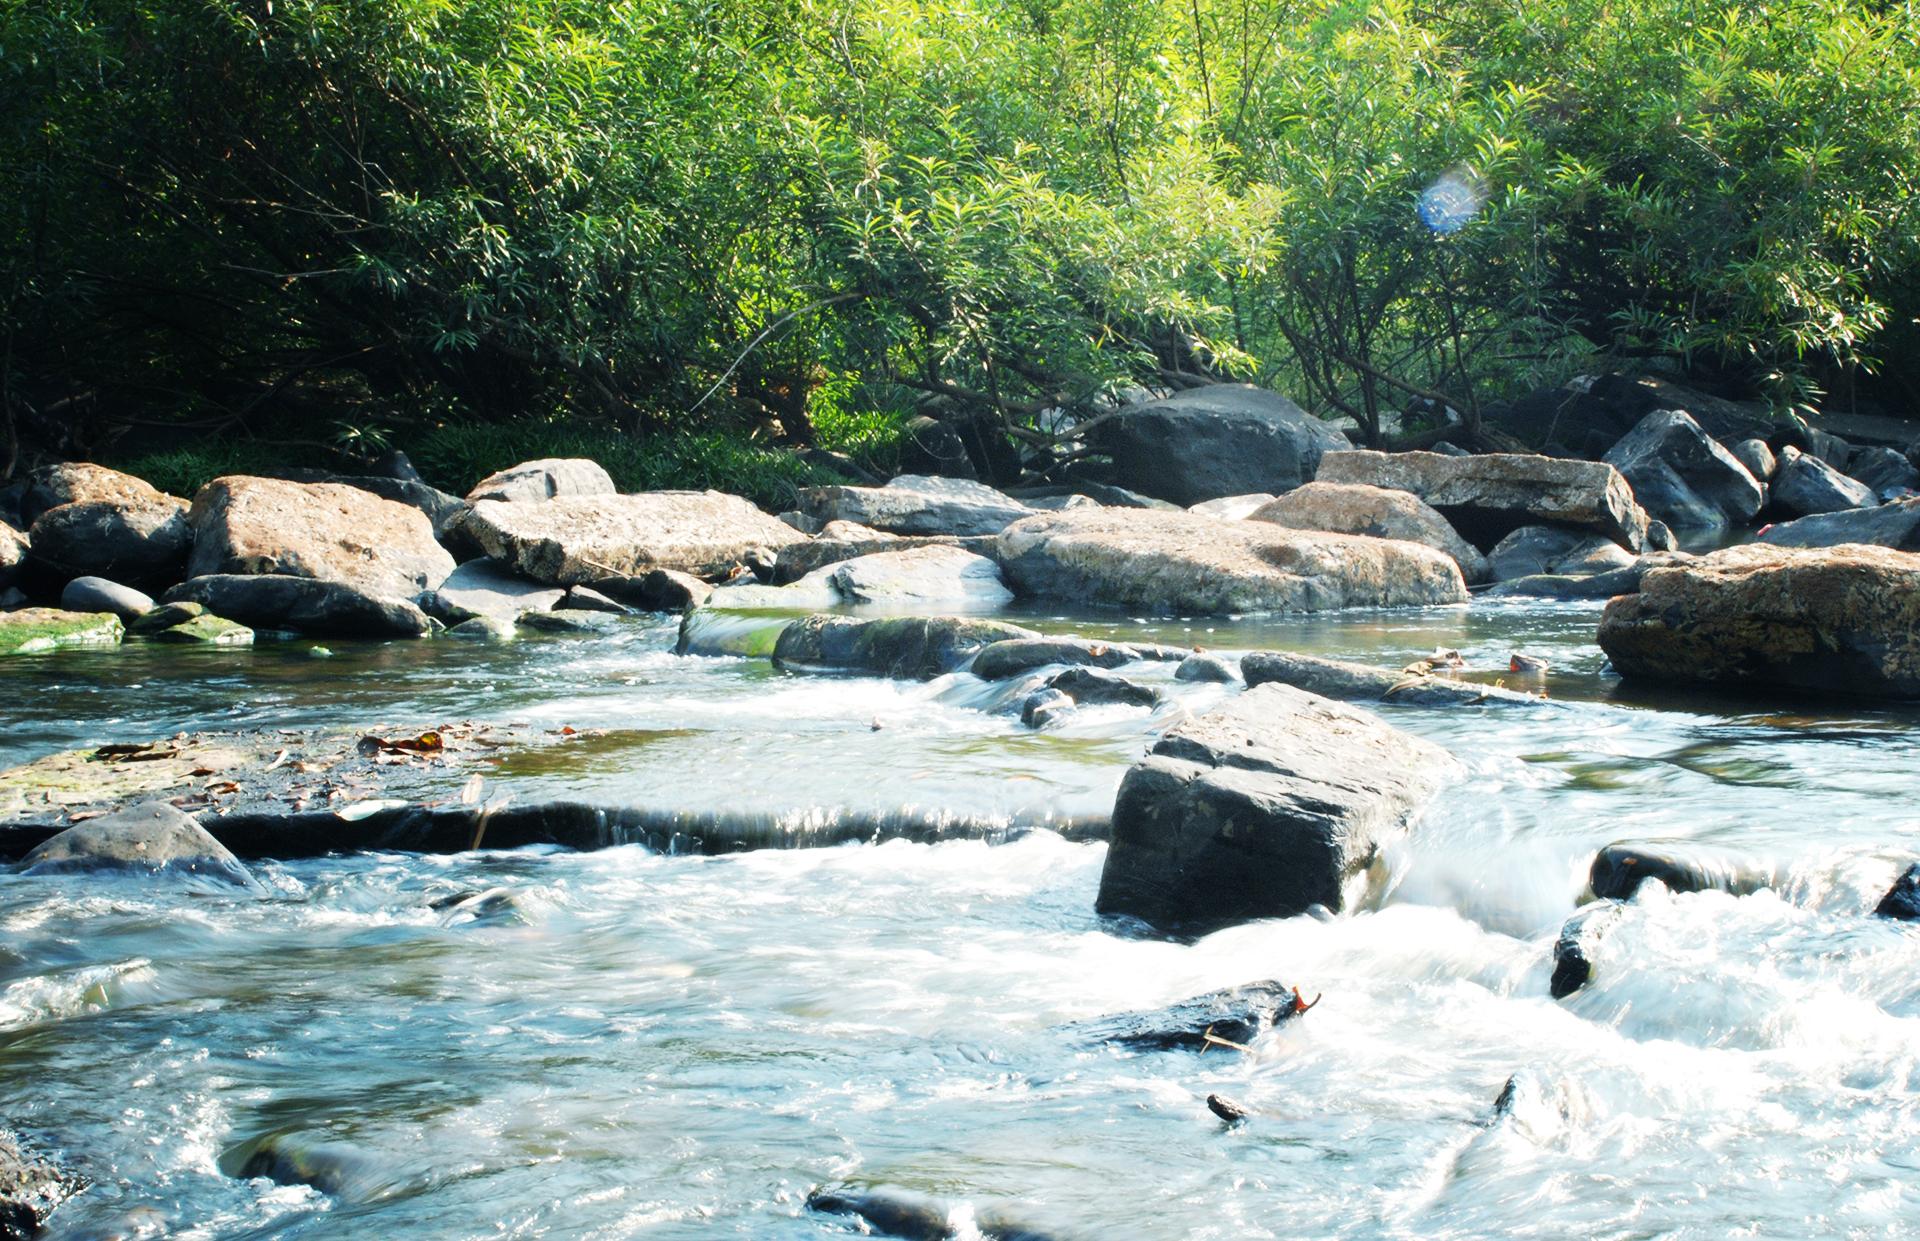 The 'KEK' River